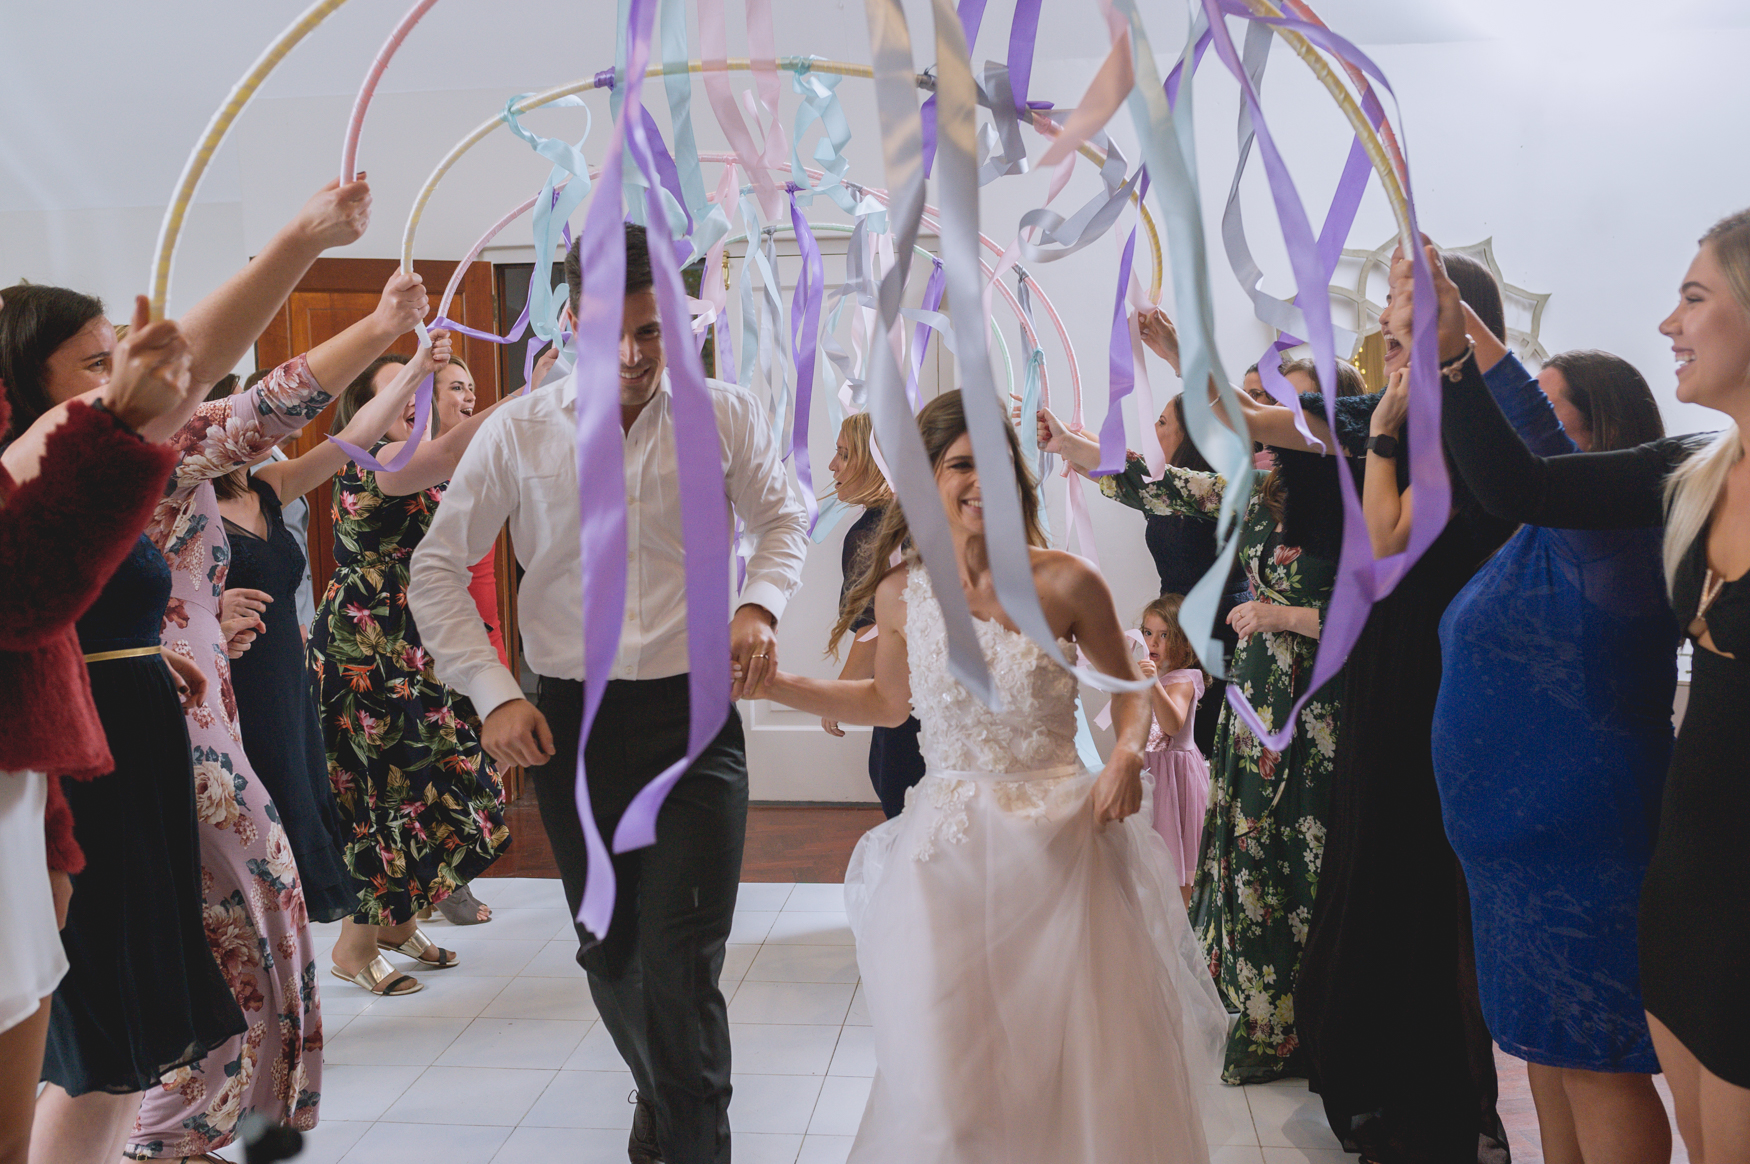 Leon_&_Martine's_Wedding_Photographs_17th_April_2019_@johnhenryweddingphoto_Low_Resolution_Web-452.JPG